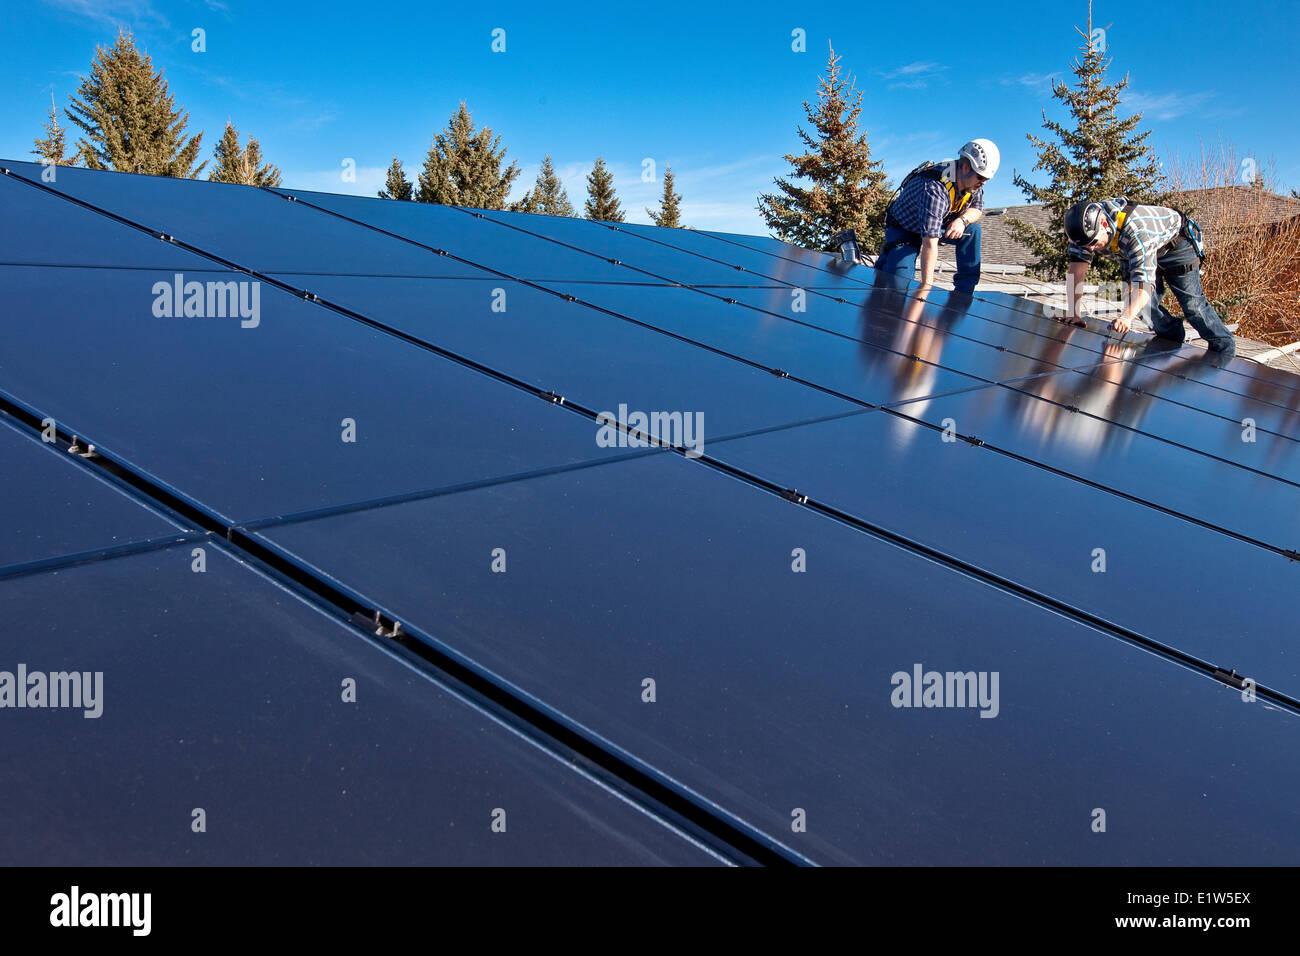 Two solar panel installers install solar panels on roof, Alberta foothills near Black Diamond, Alberta, Canada. - Stock Image